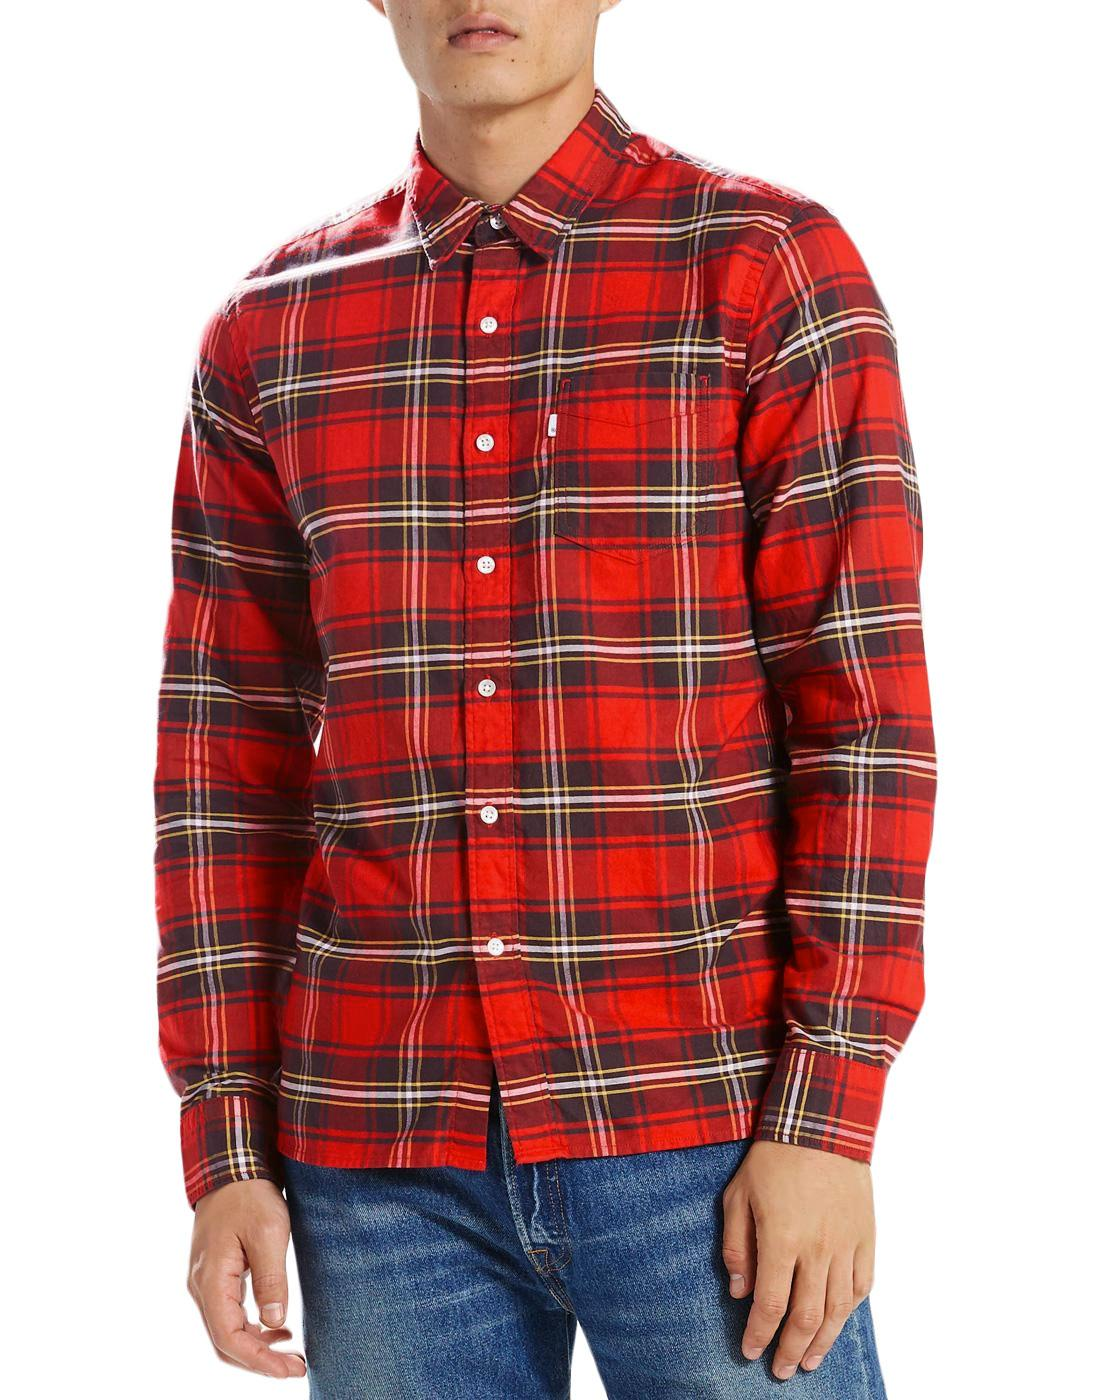 Sunset LEVI'S Retro Mod 1 Pocket Check Shirt (CR)